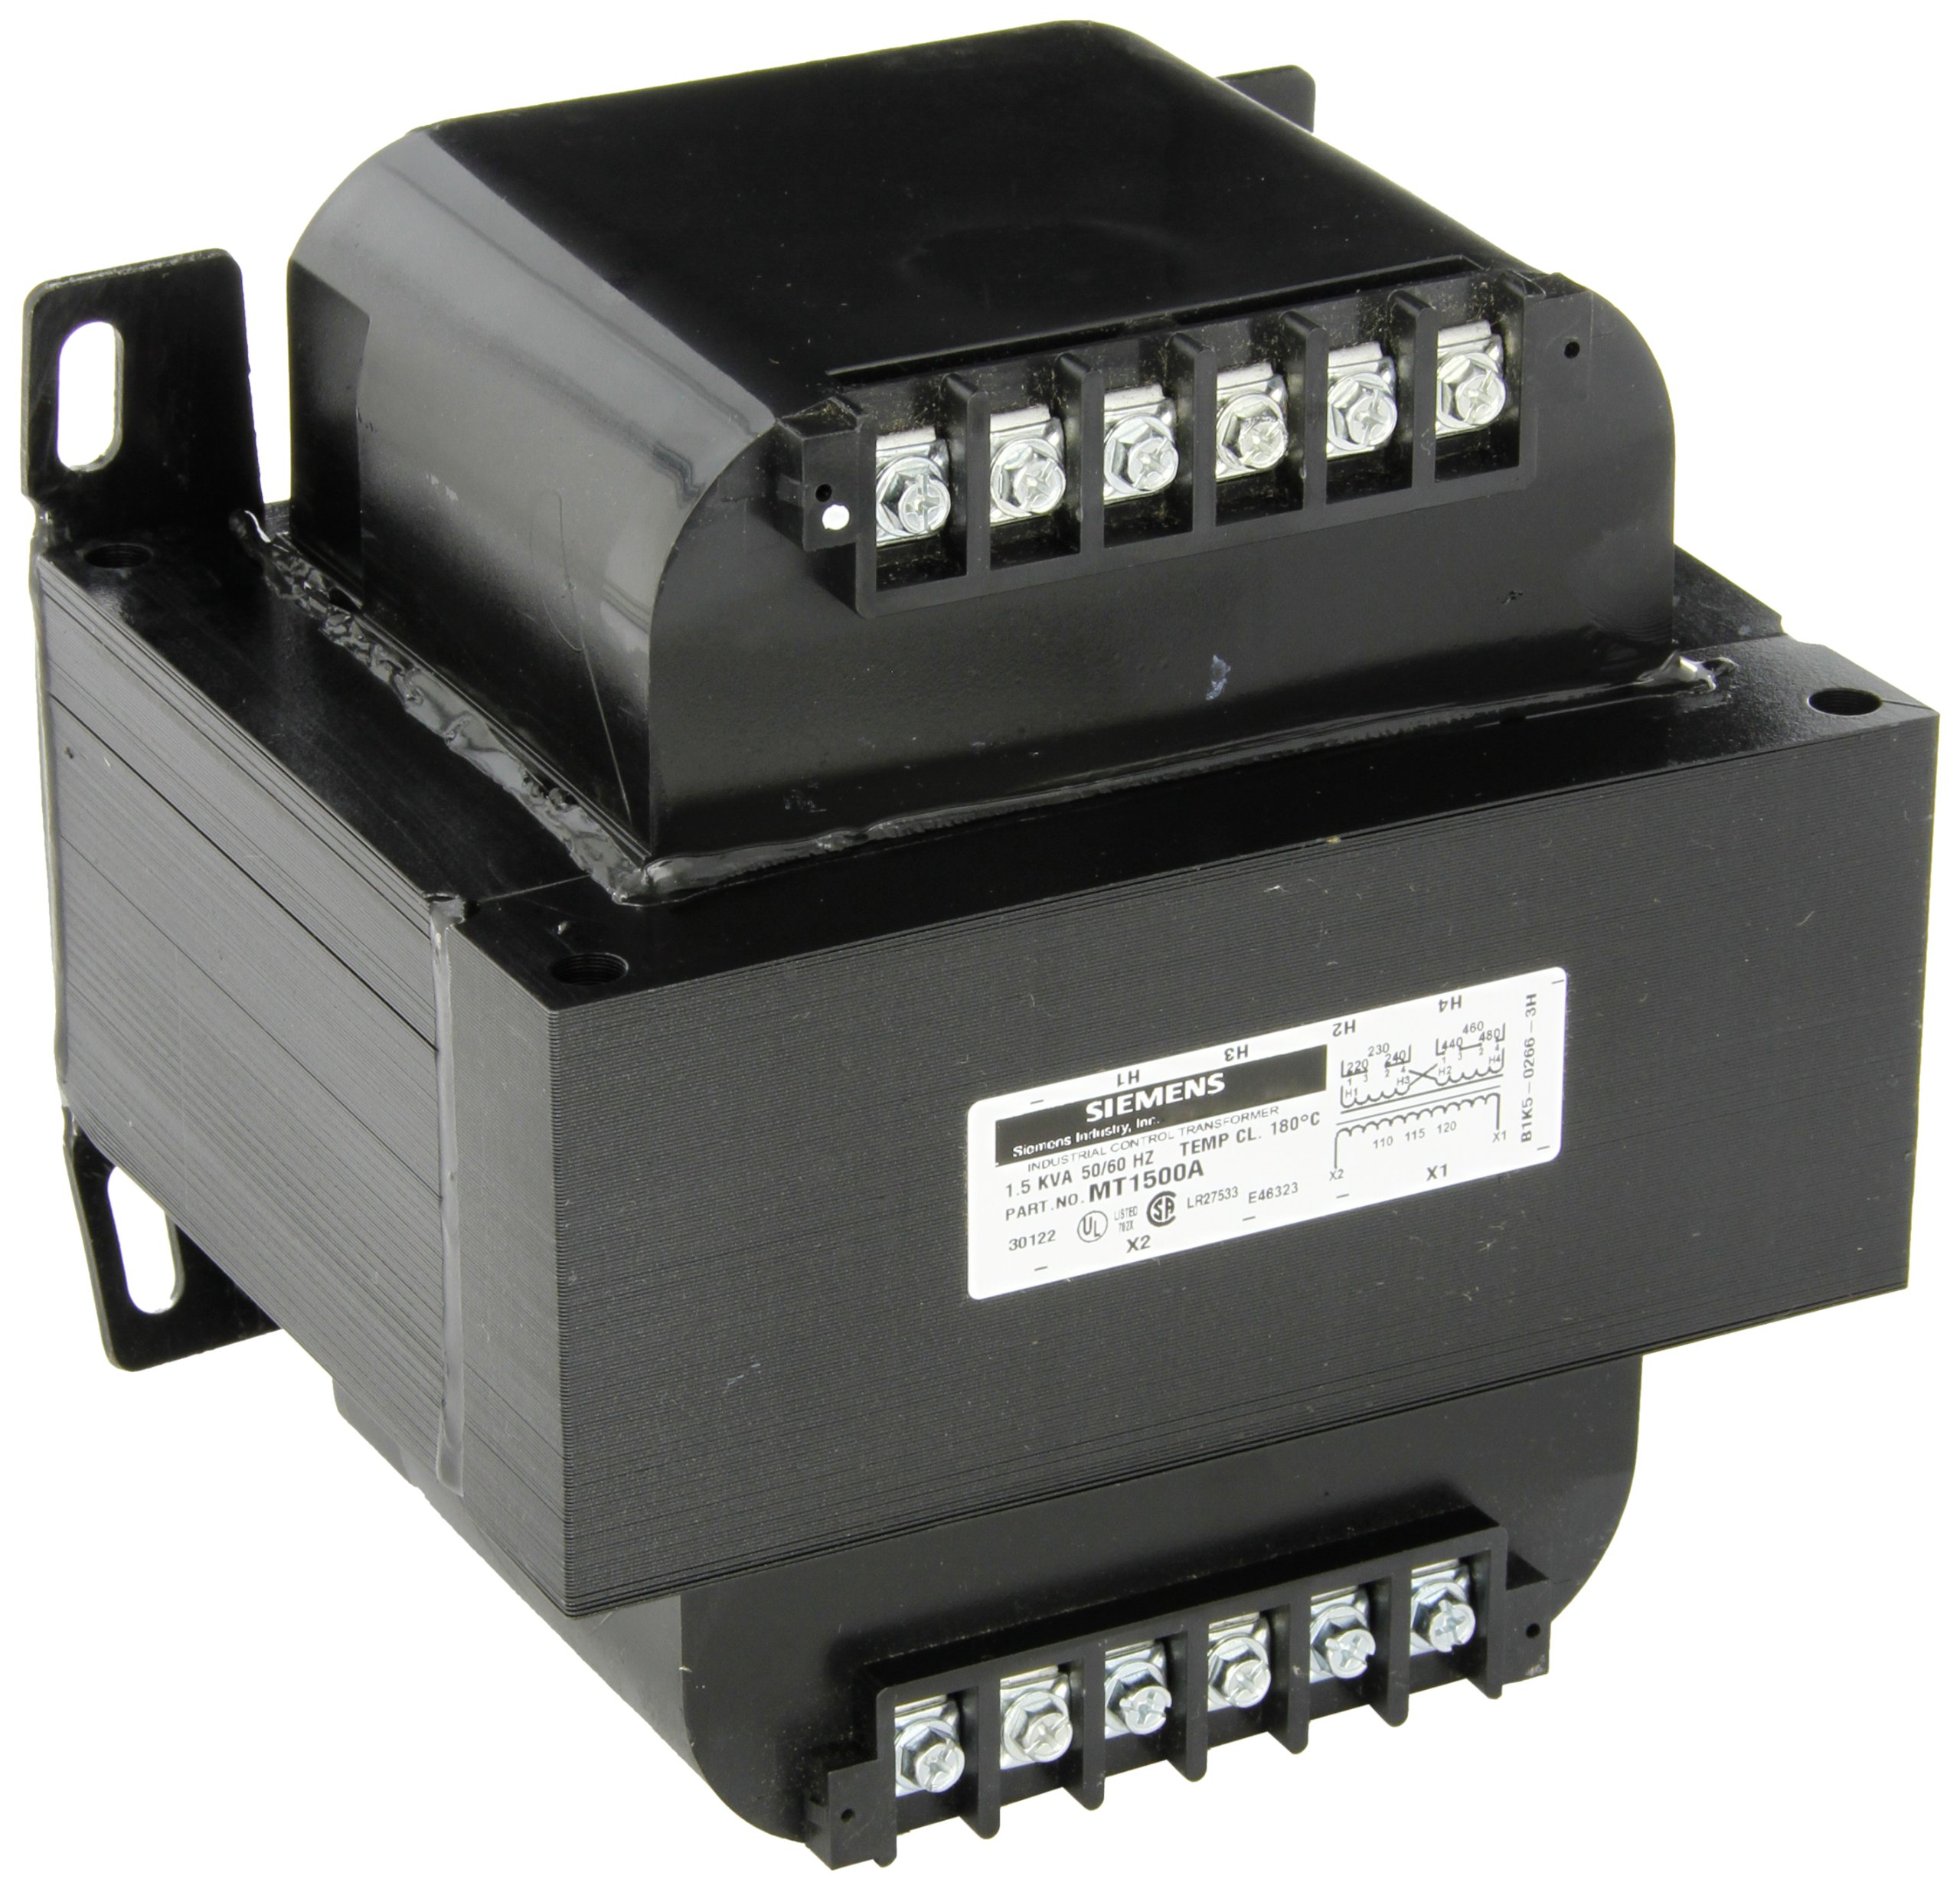 Siemens MT1500A Industrial Power Transformer, Domestic, 240 X 480, 230 X 460, 220 X 440 Primary Volts 50/60Hz, 120/115/110 Secondary Volts, 1500VA Rating